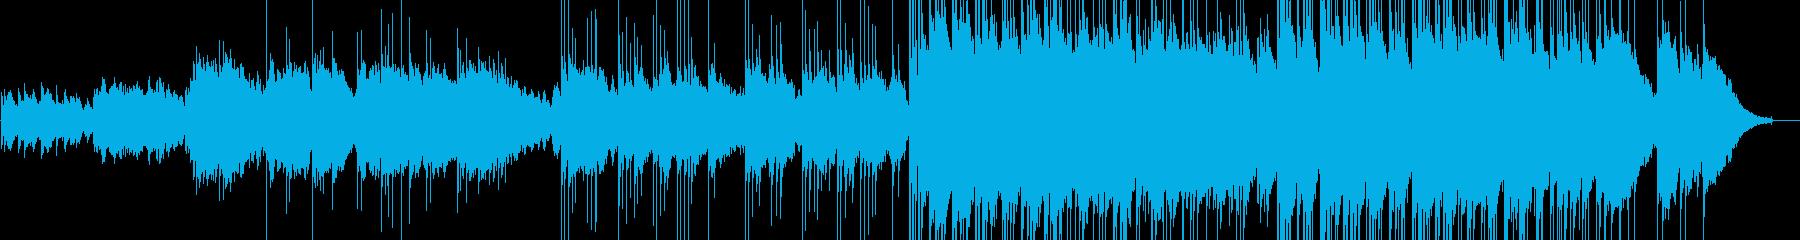 G.Gt.生録_夏のリゾートBGM1の再生済みの波形